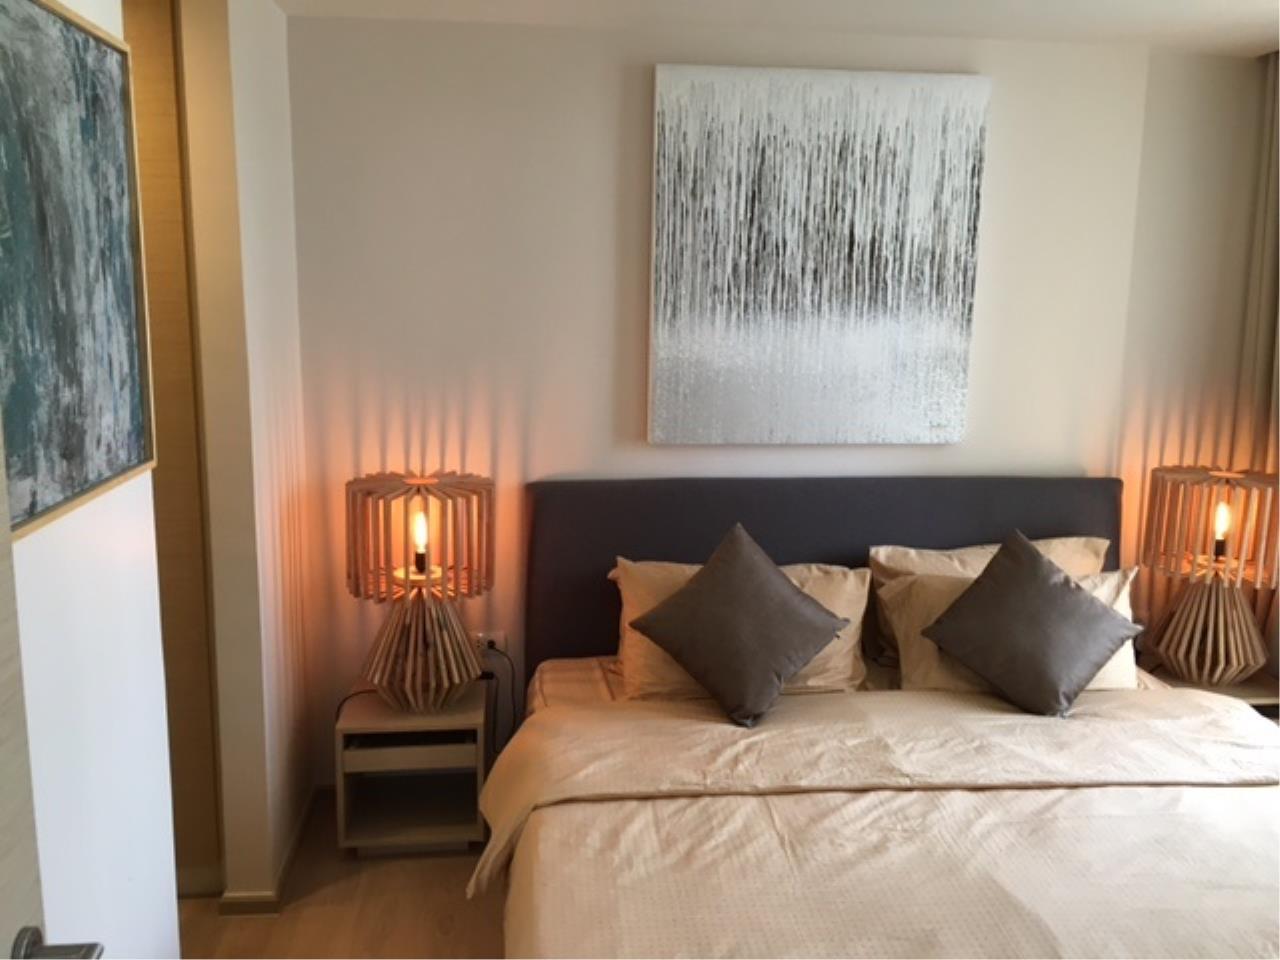 Century21 Skylux Agency's Liv@49 / Condo For Sale / 3 Bedroom / 94.31 SQM / BTS Thong Lo / Bangkok 4